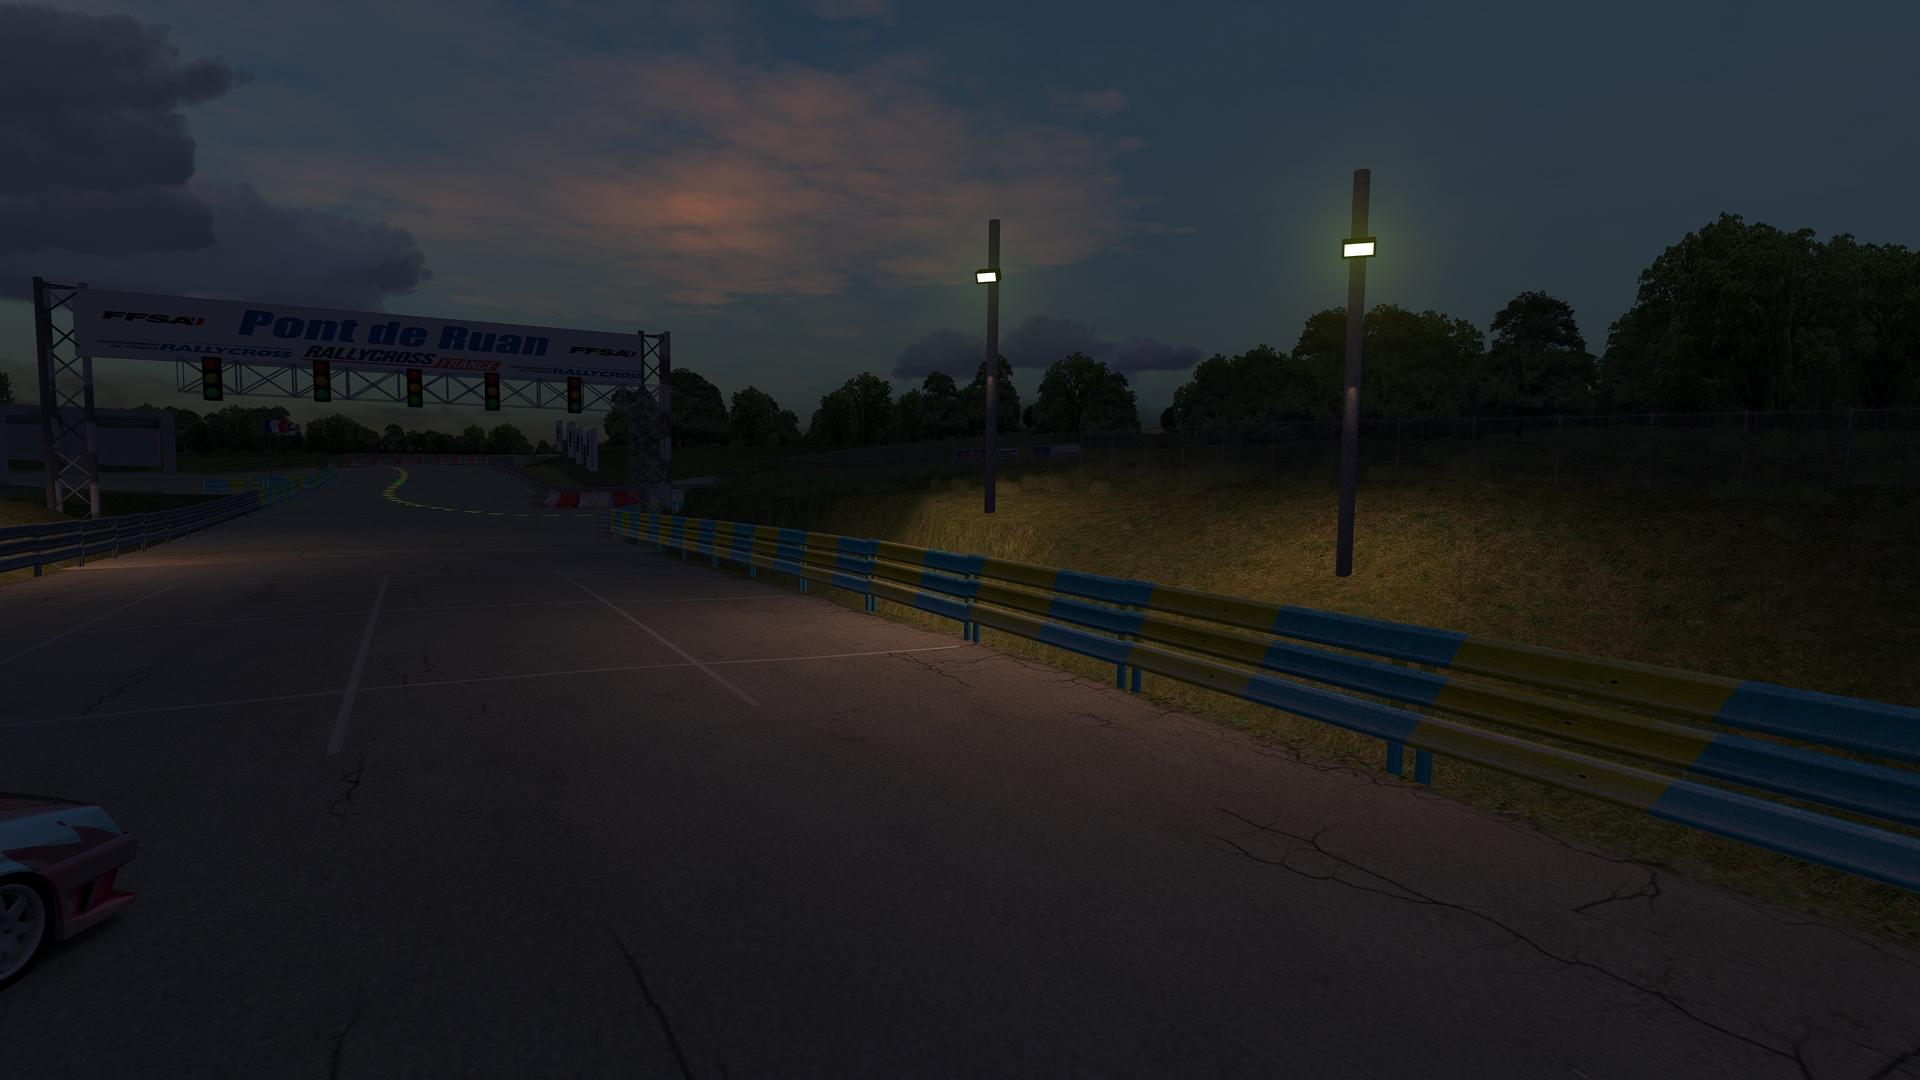 Screenshot_zizh_lada2108_t1600luk_ponderuans_track_14-1-121-11-12-40.jpg